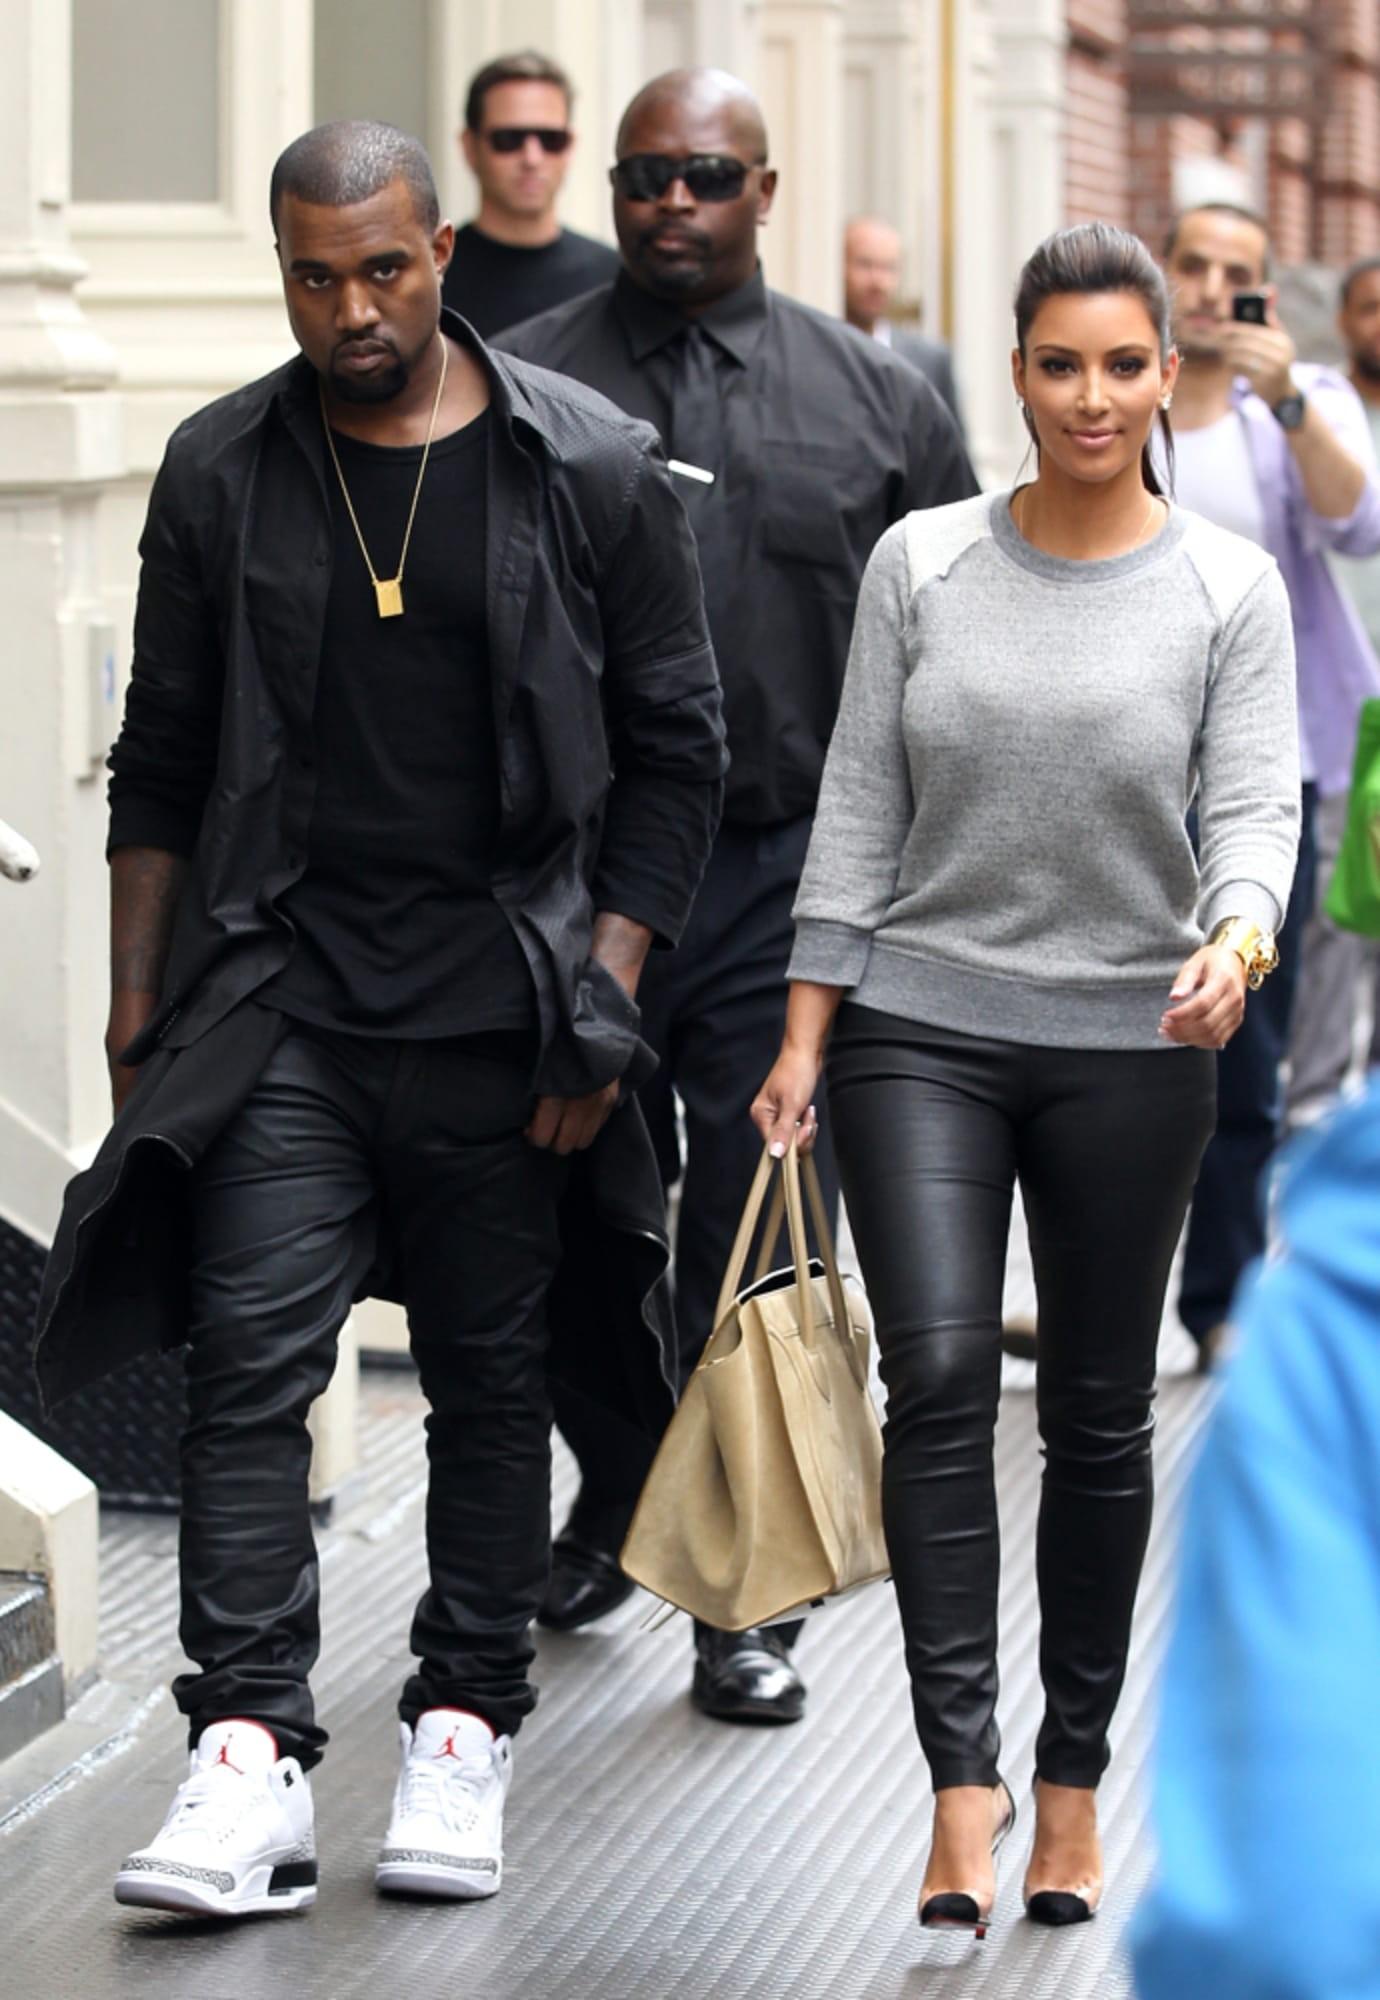 Kanye West in the Air Jordan 3